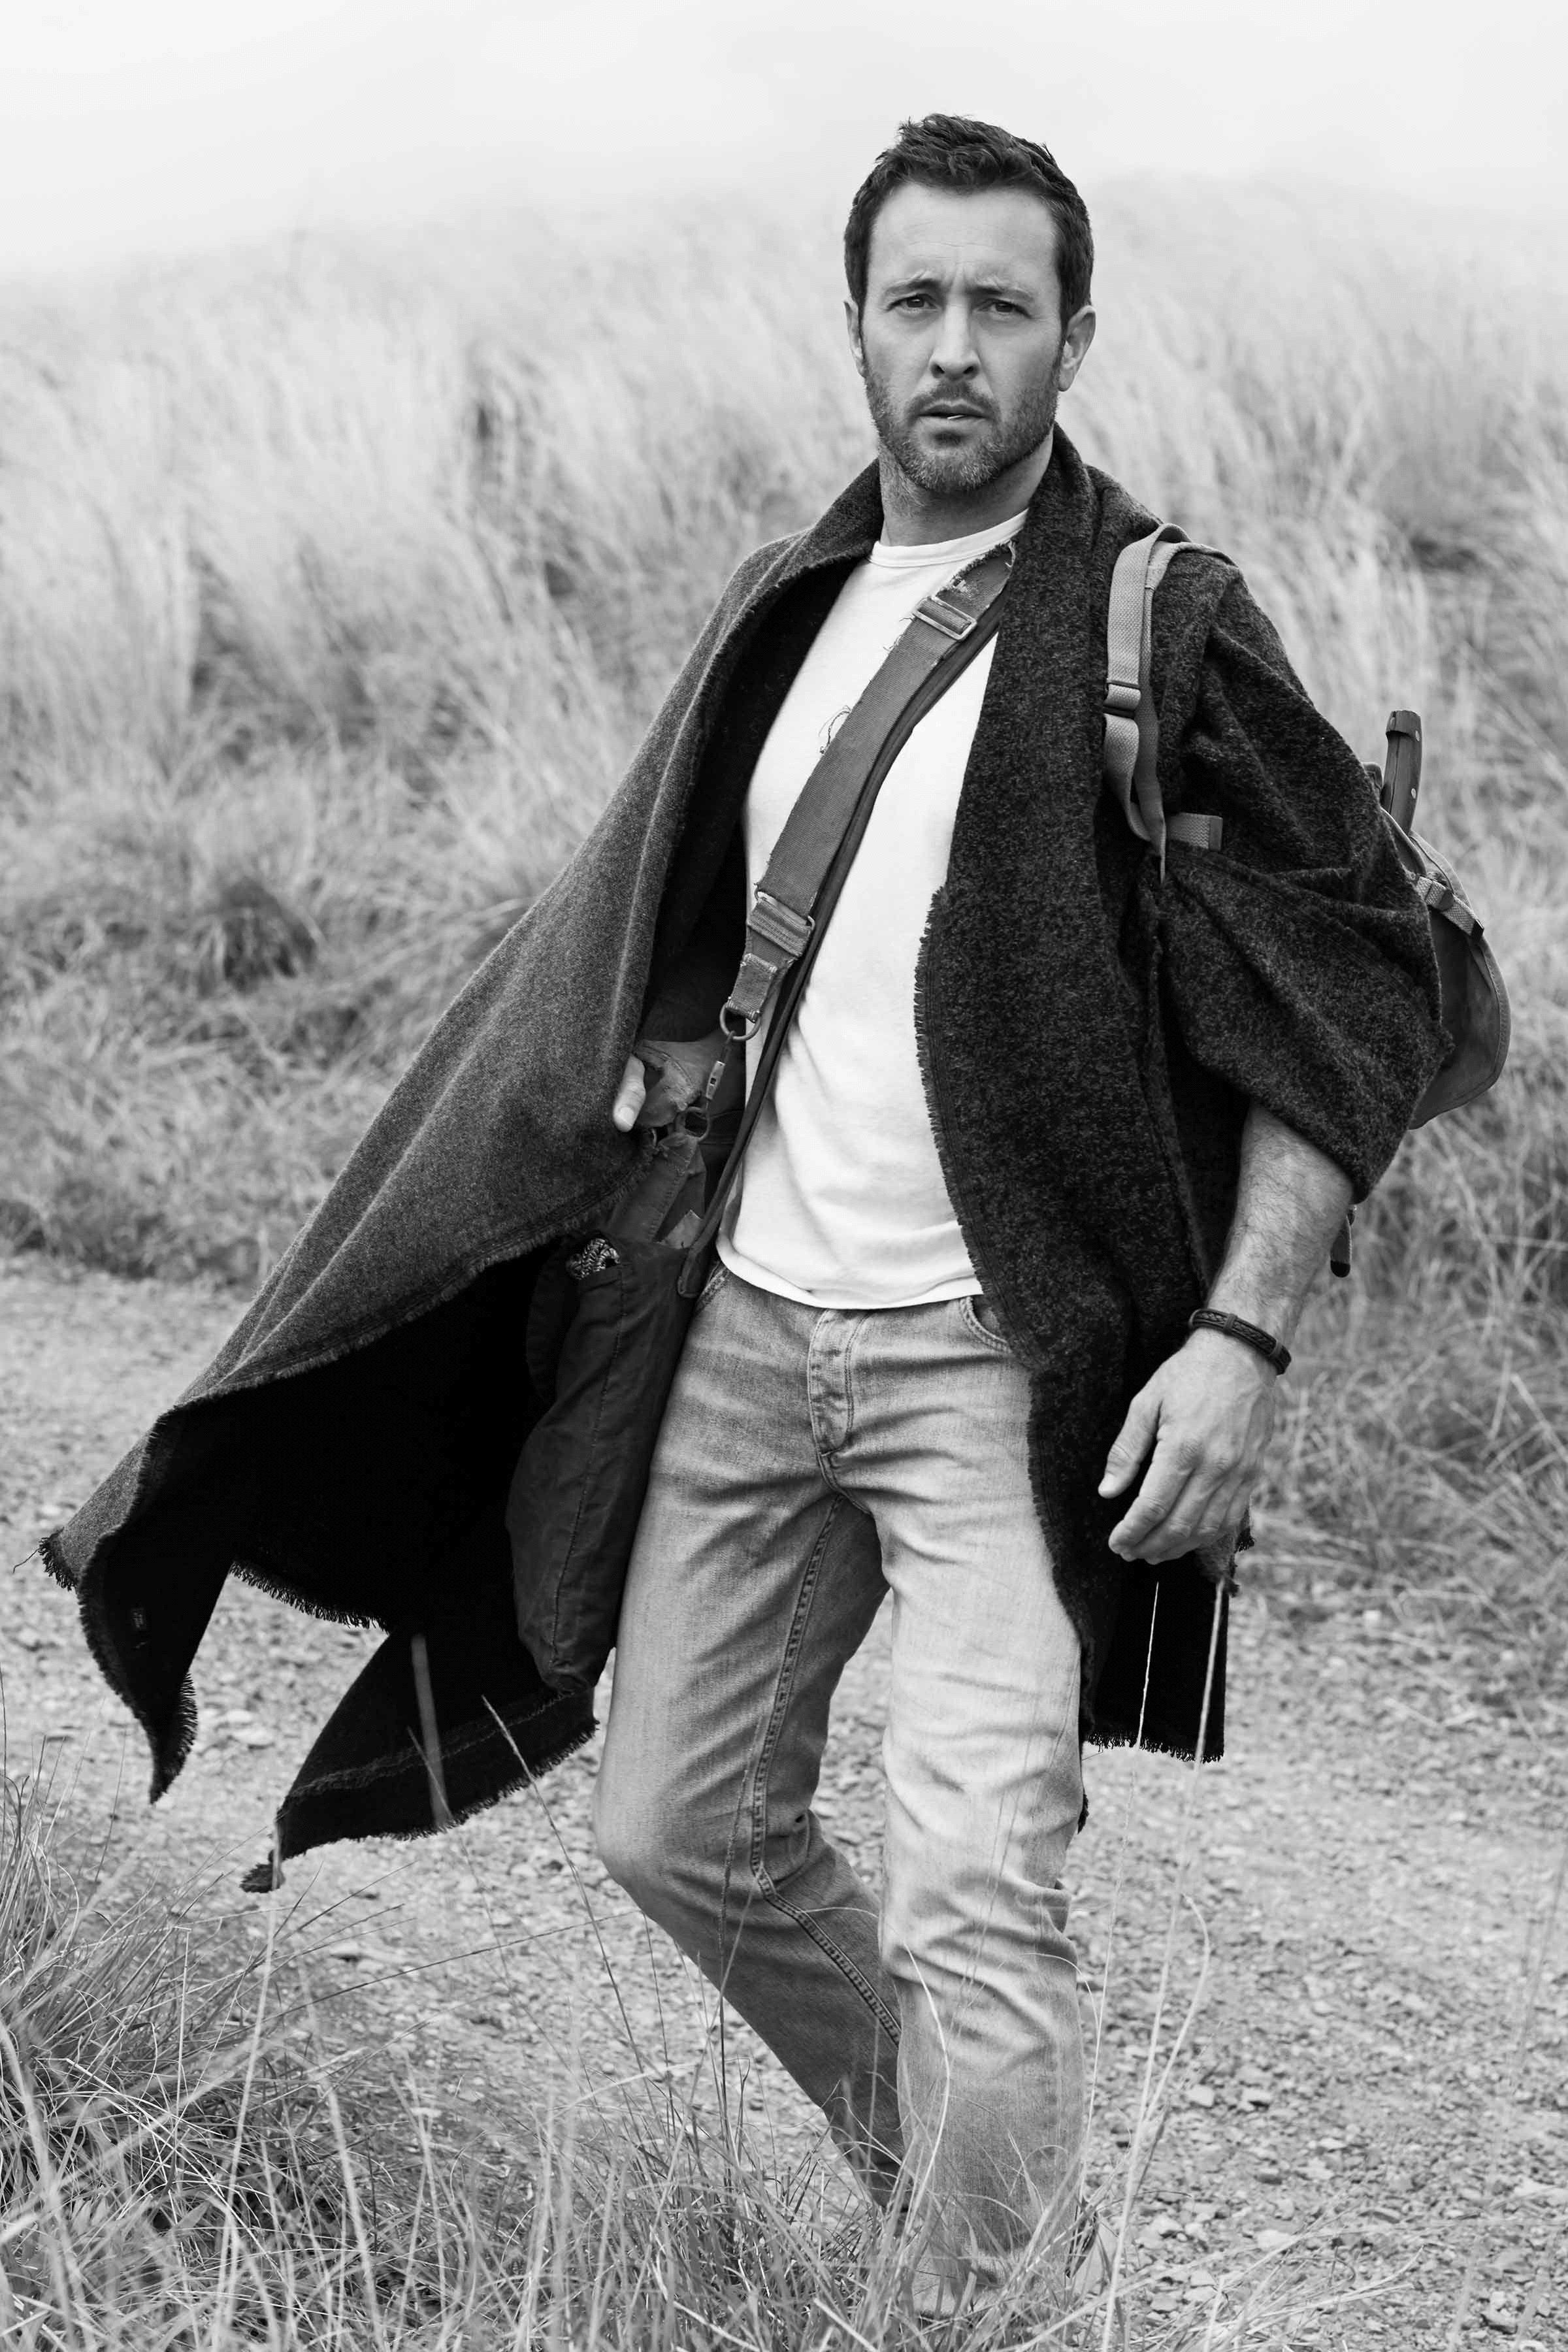 Black and white photo of Alex O'Loughlin hiking.